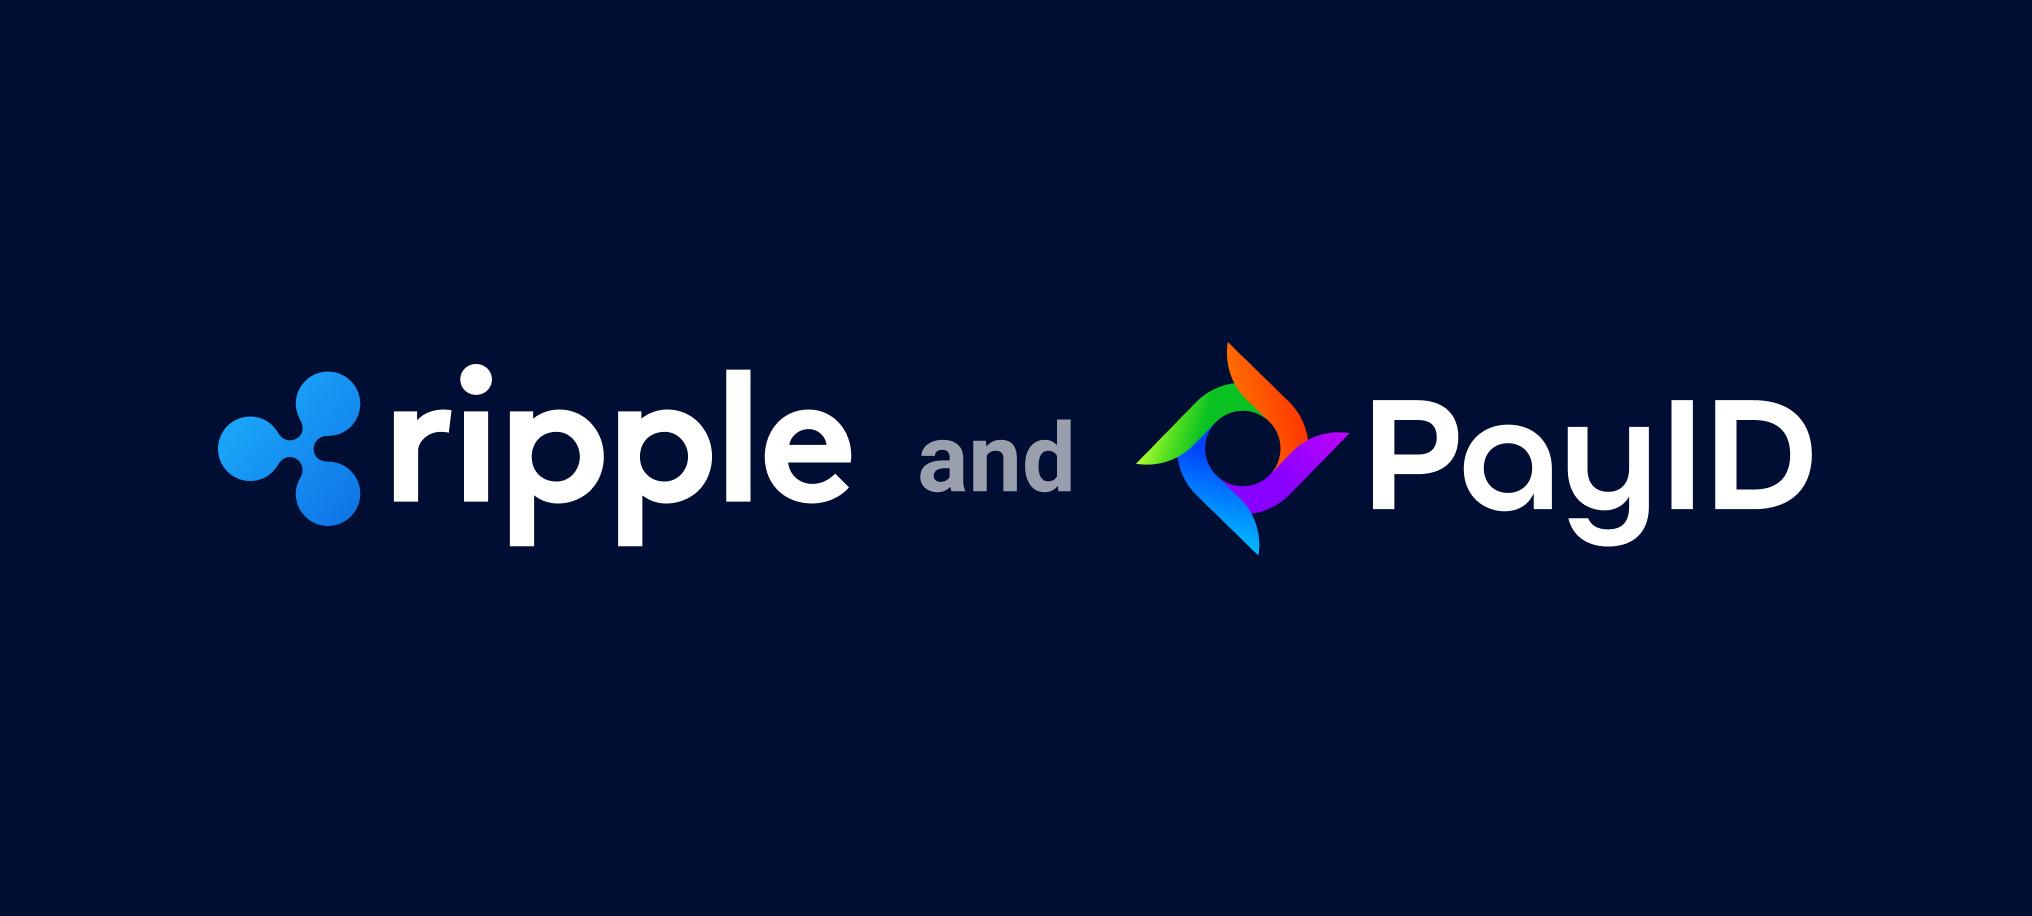 PayID - Ripple